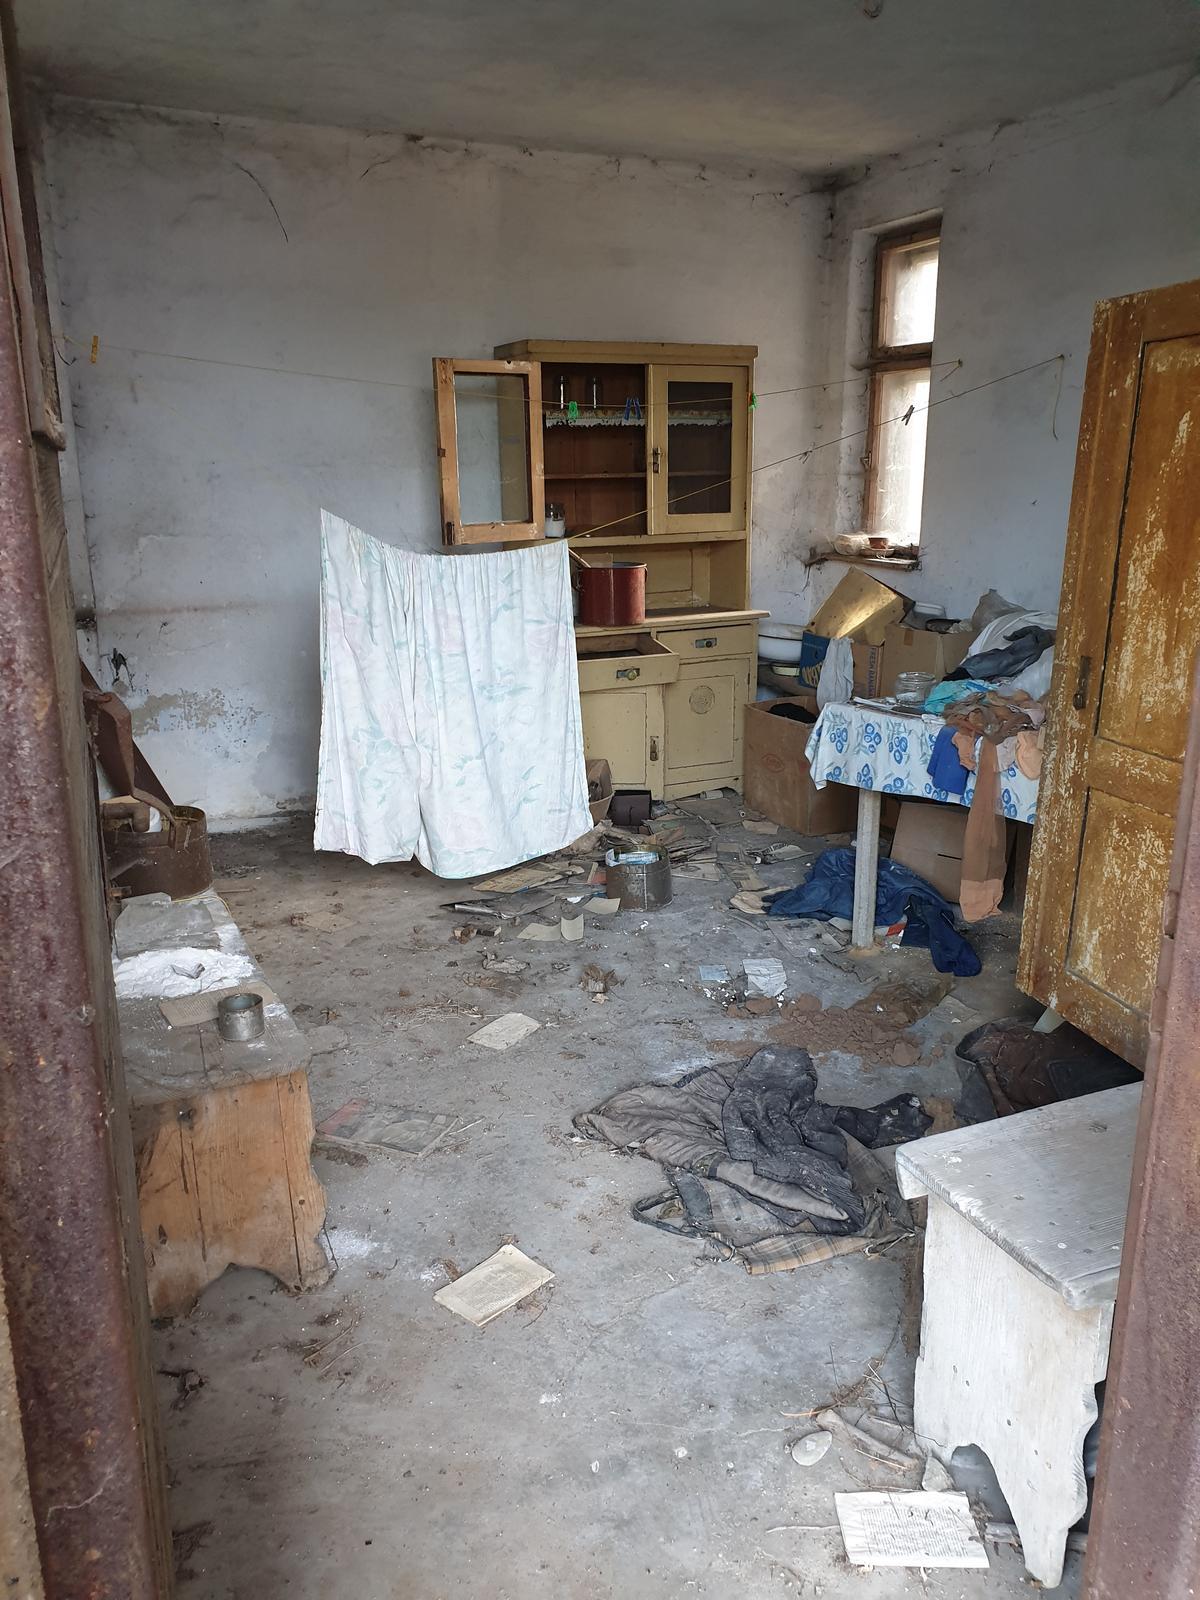 Rekonštrukcia domu-alebo chceme si splniť sen =》🏠🌻🌼🐶  mat domcek a vratit sa na Slovensko - ou :-D to bola letna kuchyna, uz je tam nasa izba kde mozeme spat ked prideme na SK